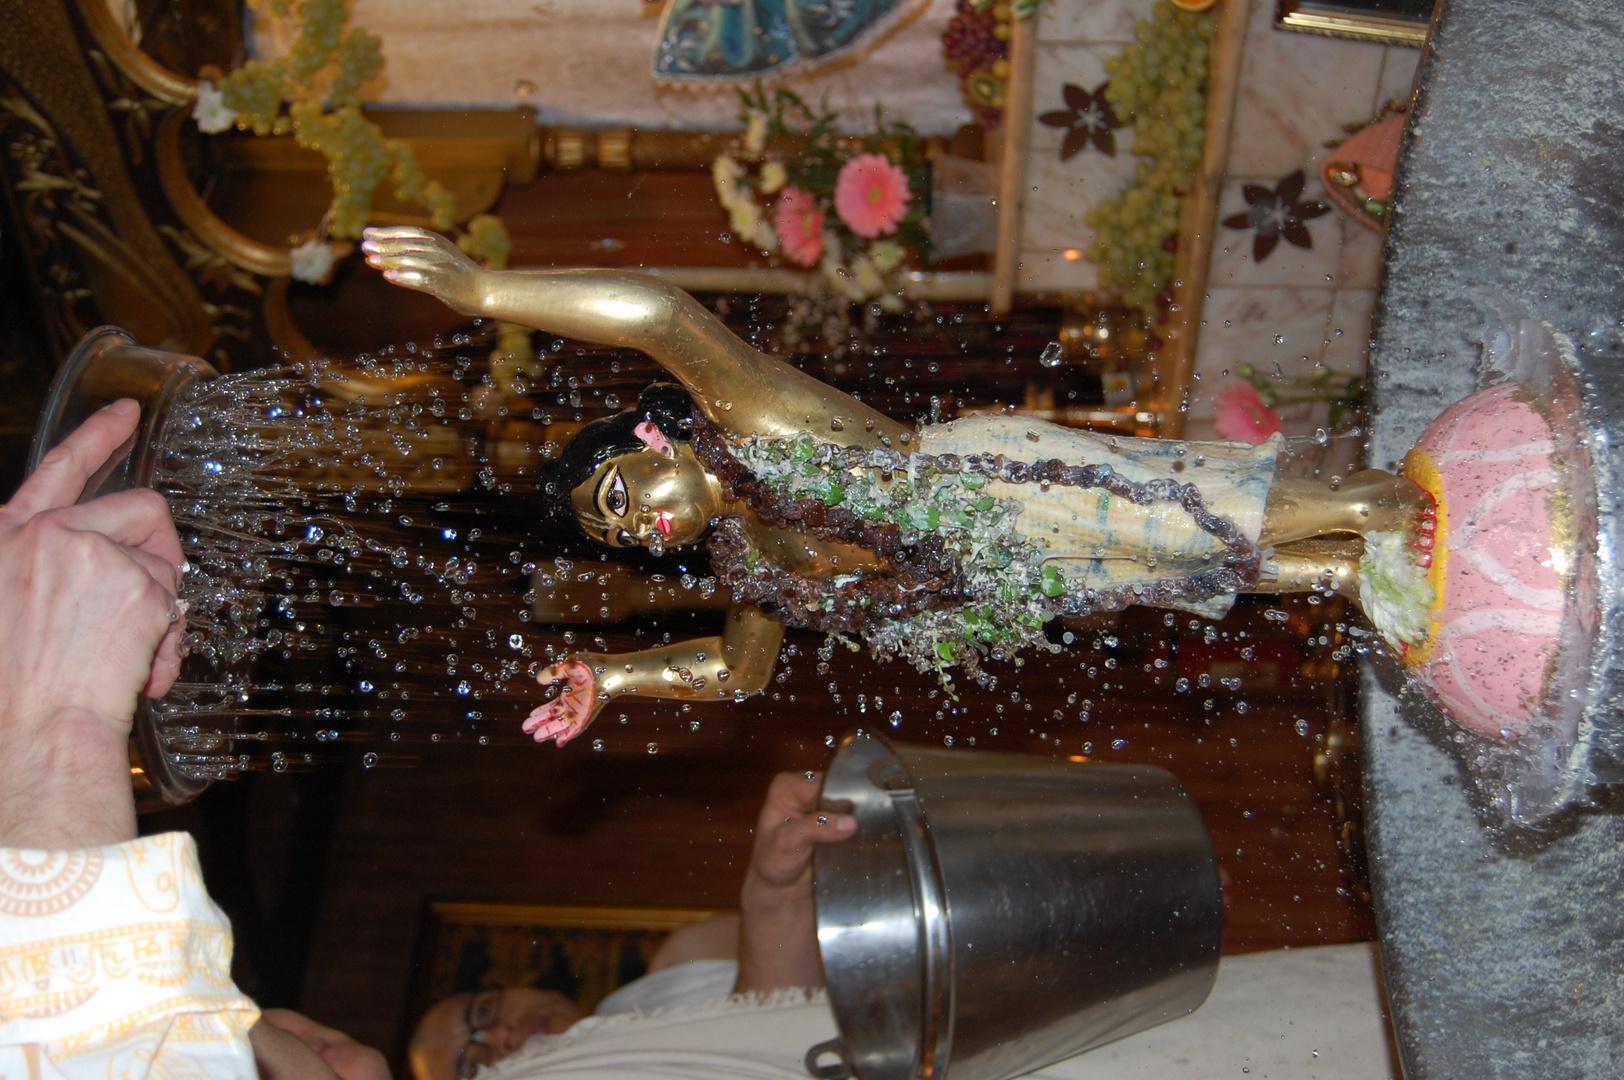 Sri Sri Gauranga's abishek